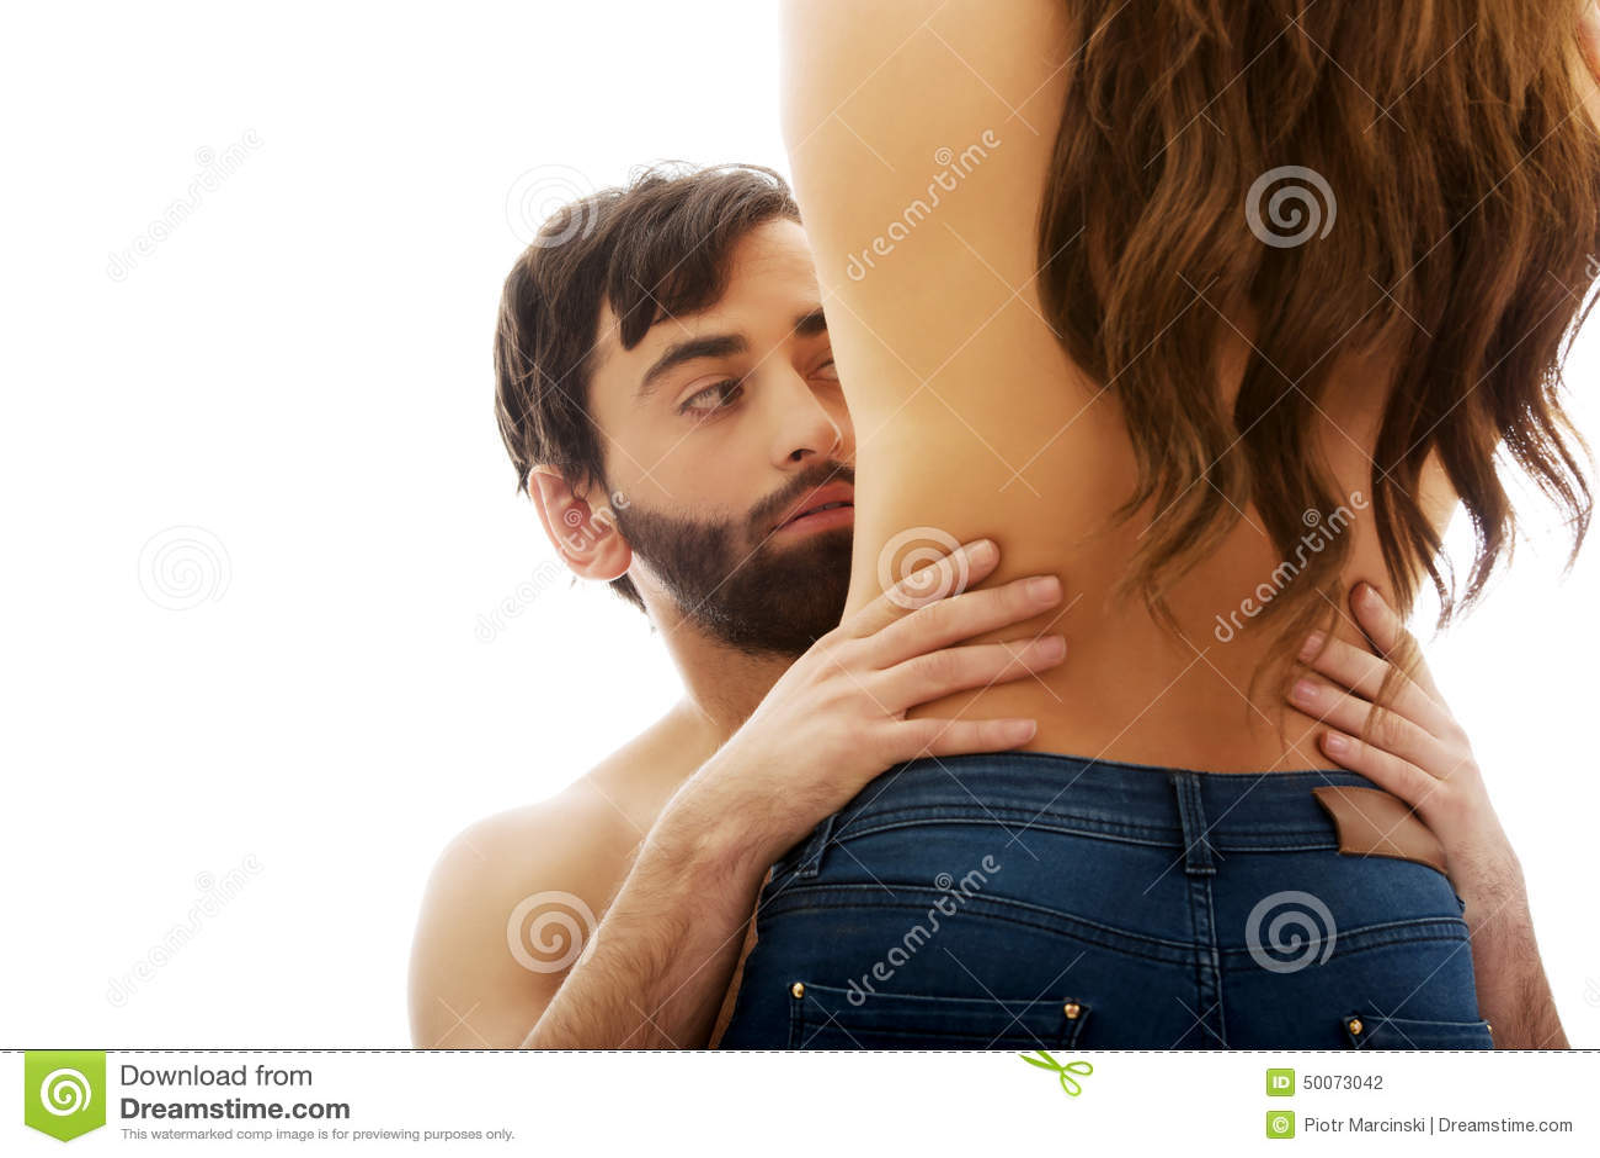 Man touching silm woman s waist.